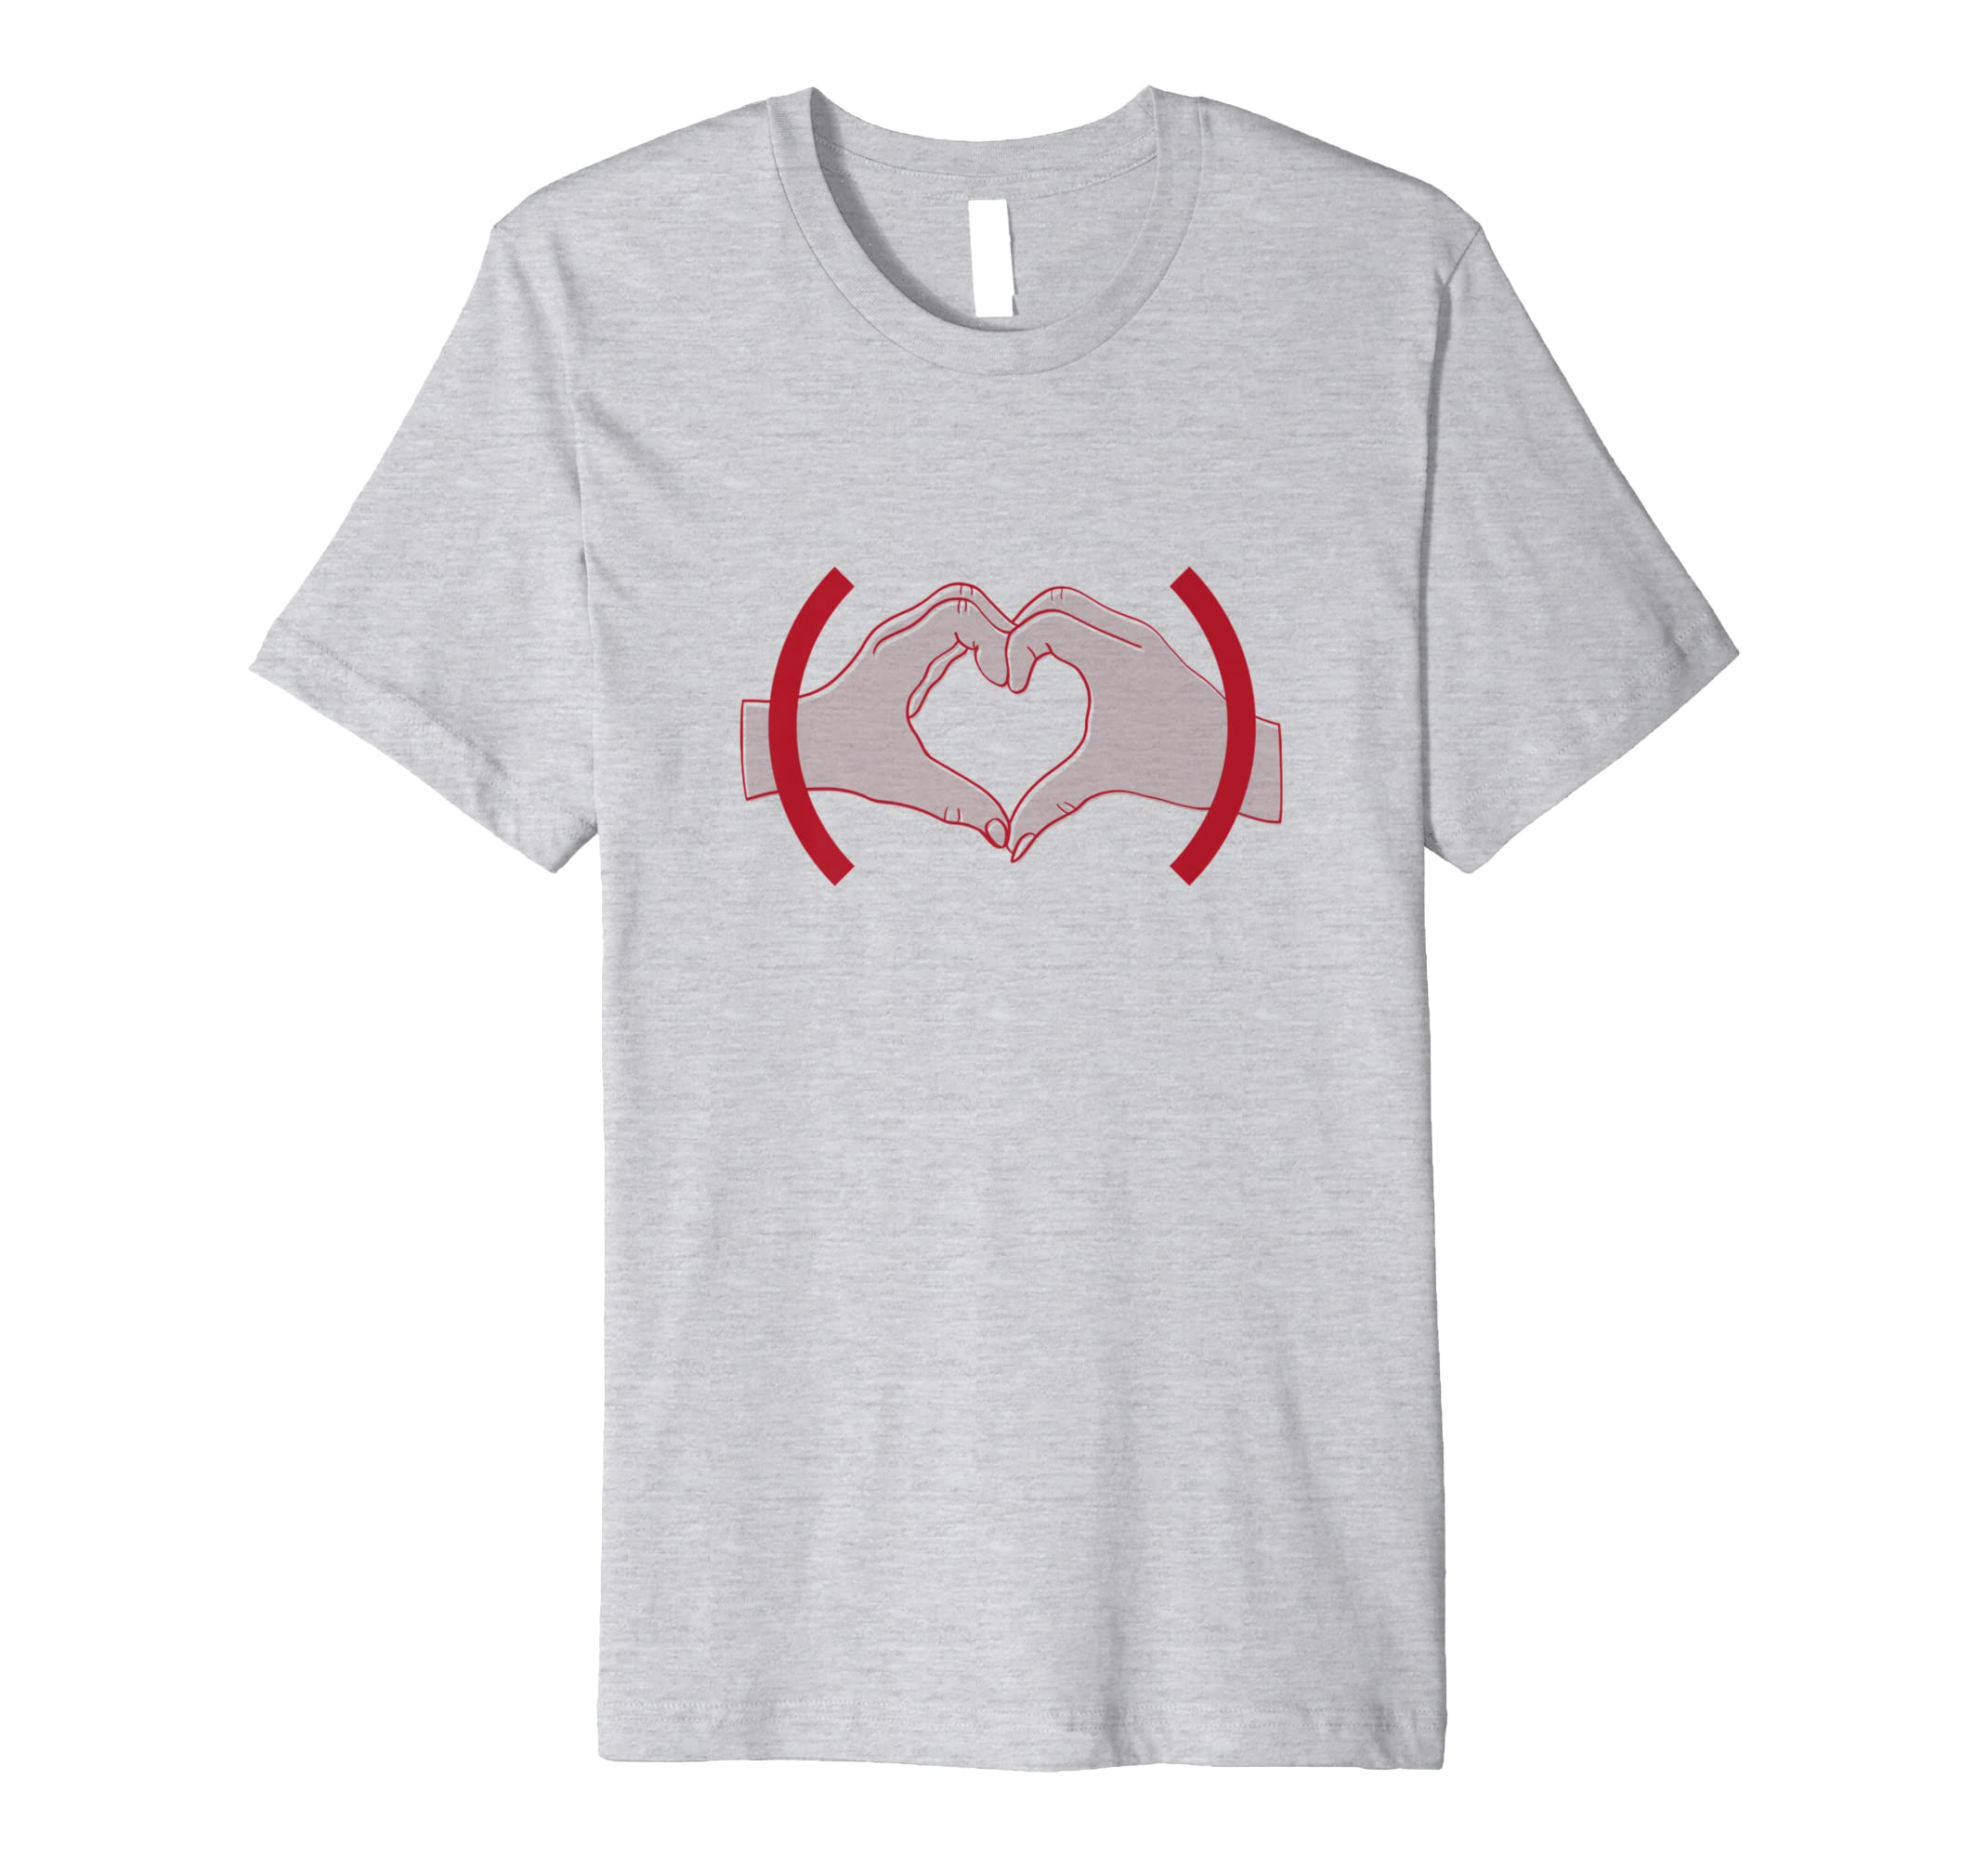 (PRODUCT)RED Heart Hands T shirt-azvn